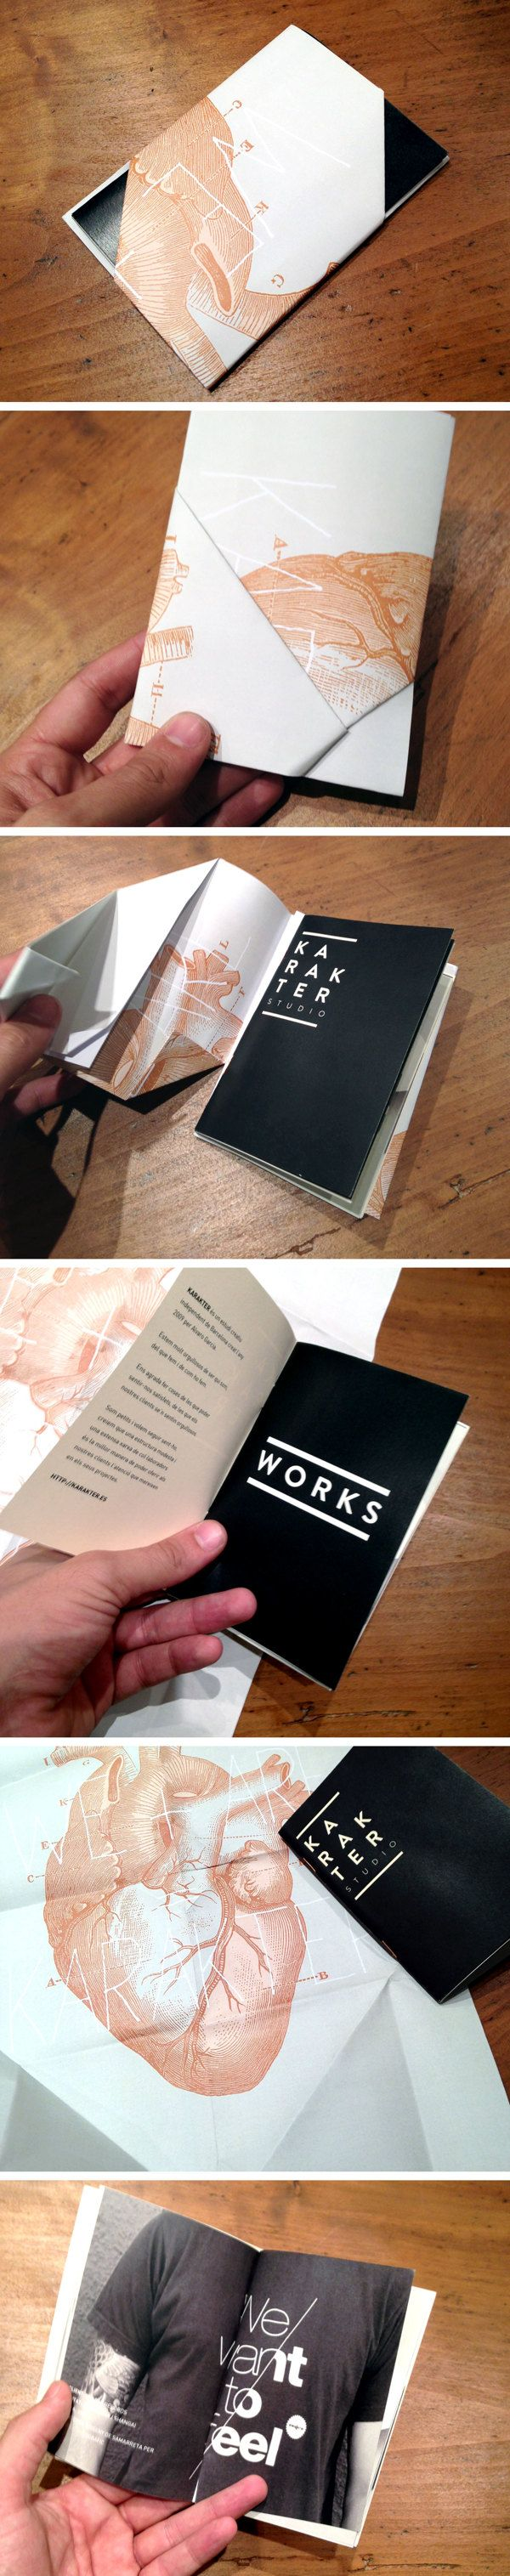 Printed Dossier by Karakter , via Behance #portfolio #designer // Editorial, cartell incorporat en un catàleg. Disseny.